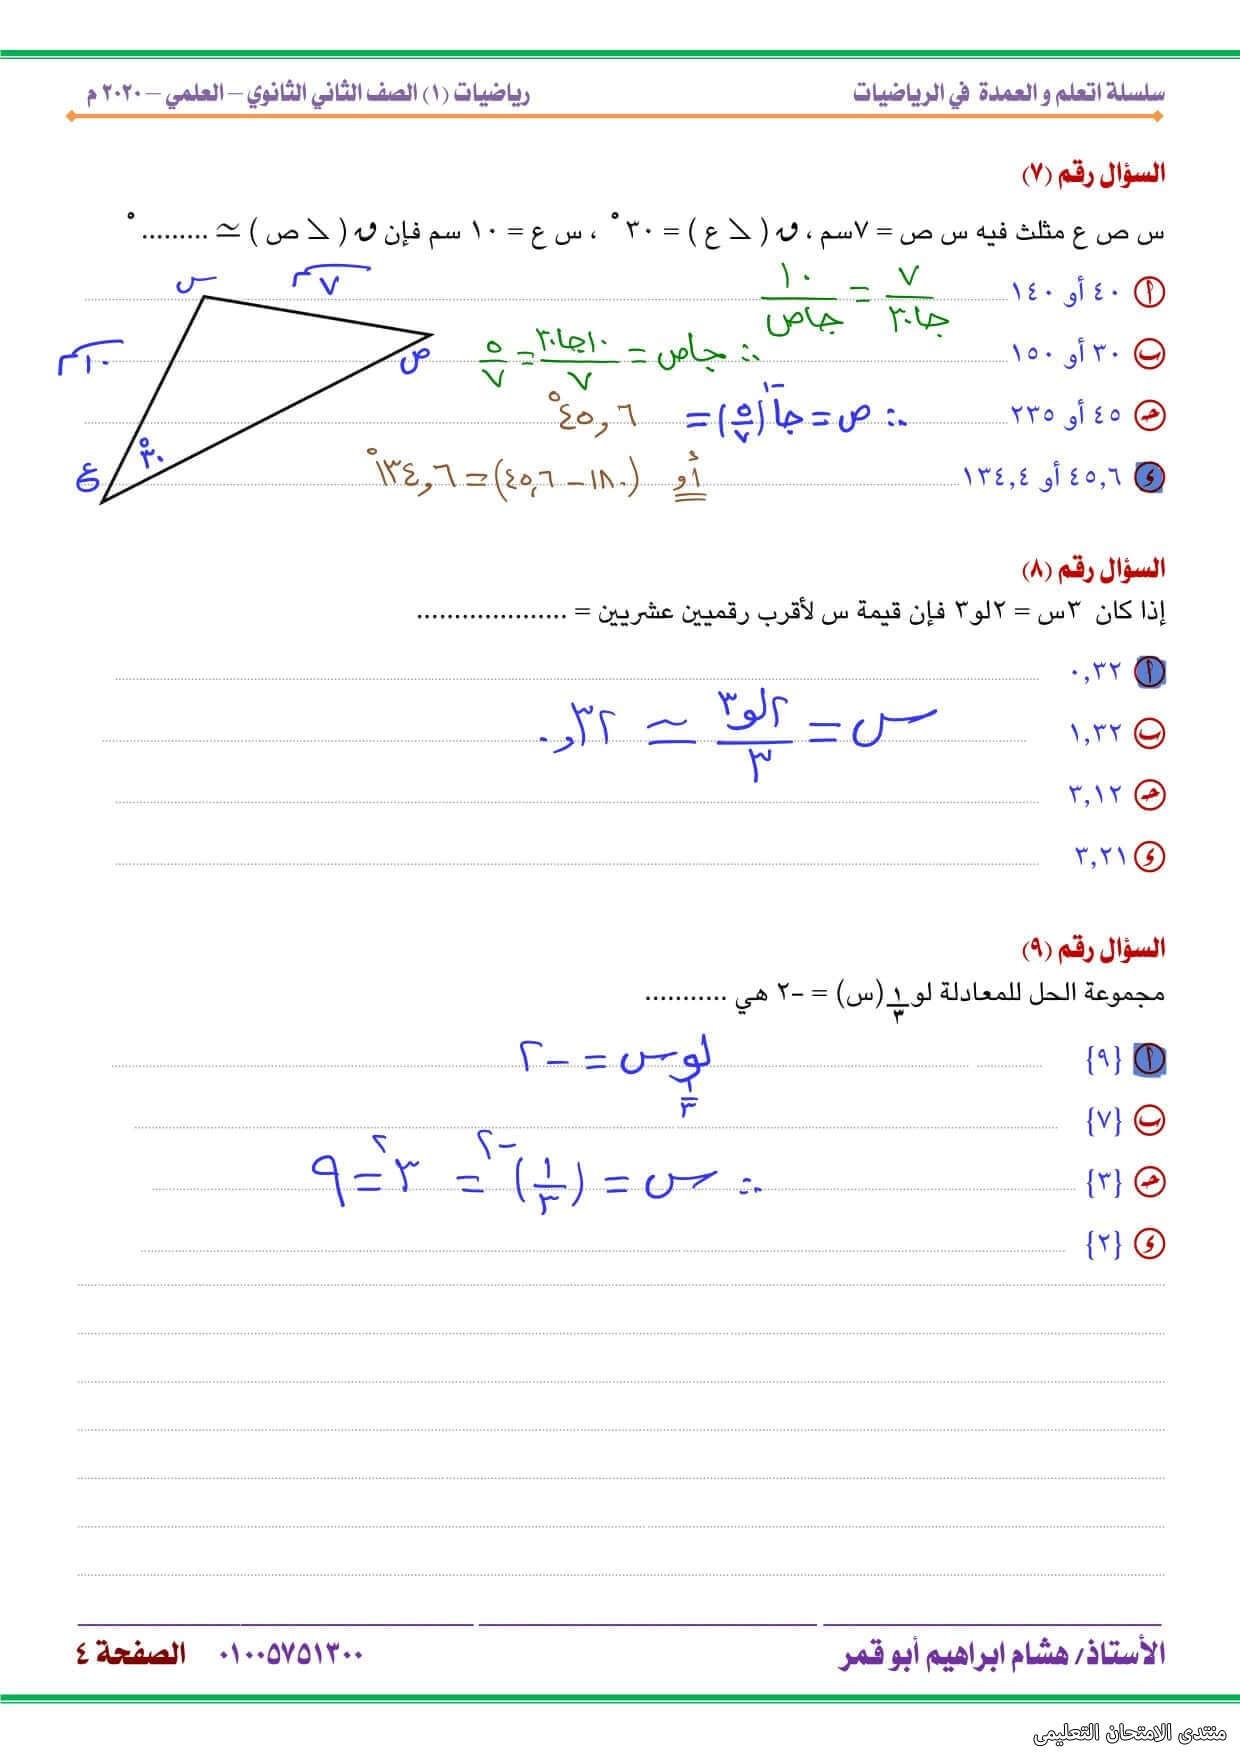 exam-eg.com_161444094916193.jpg